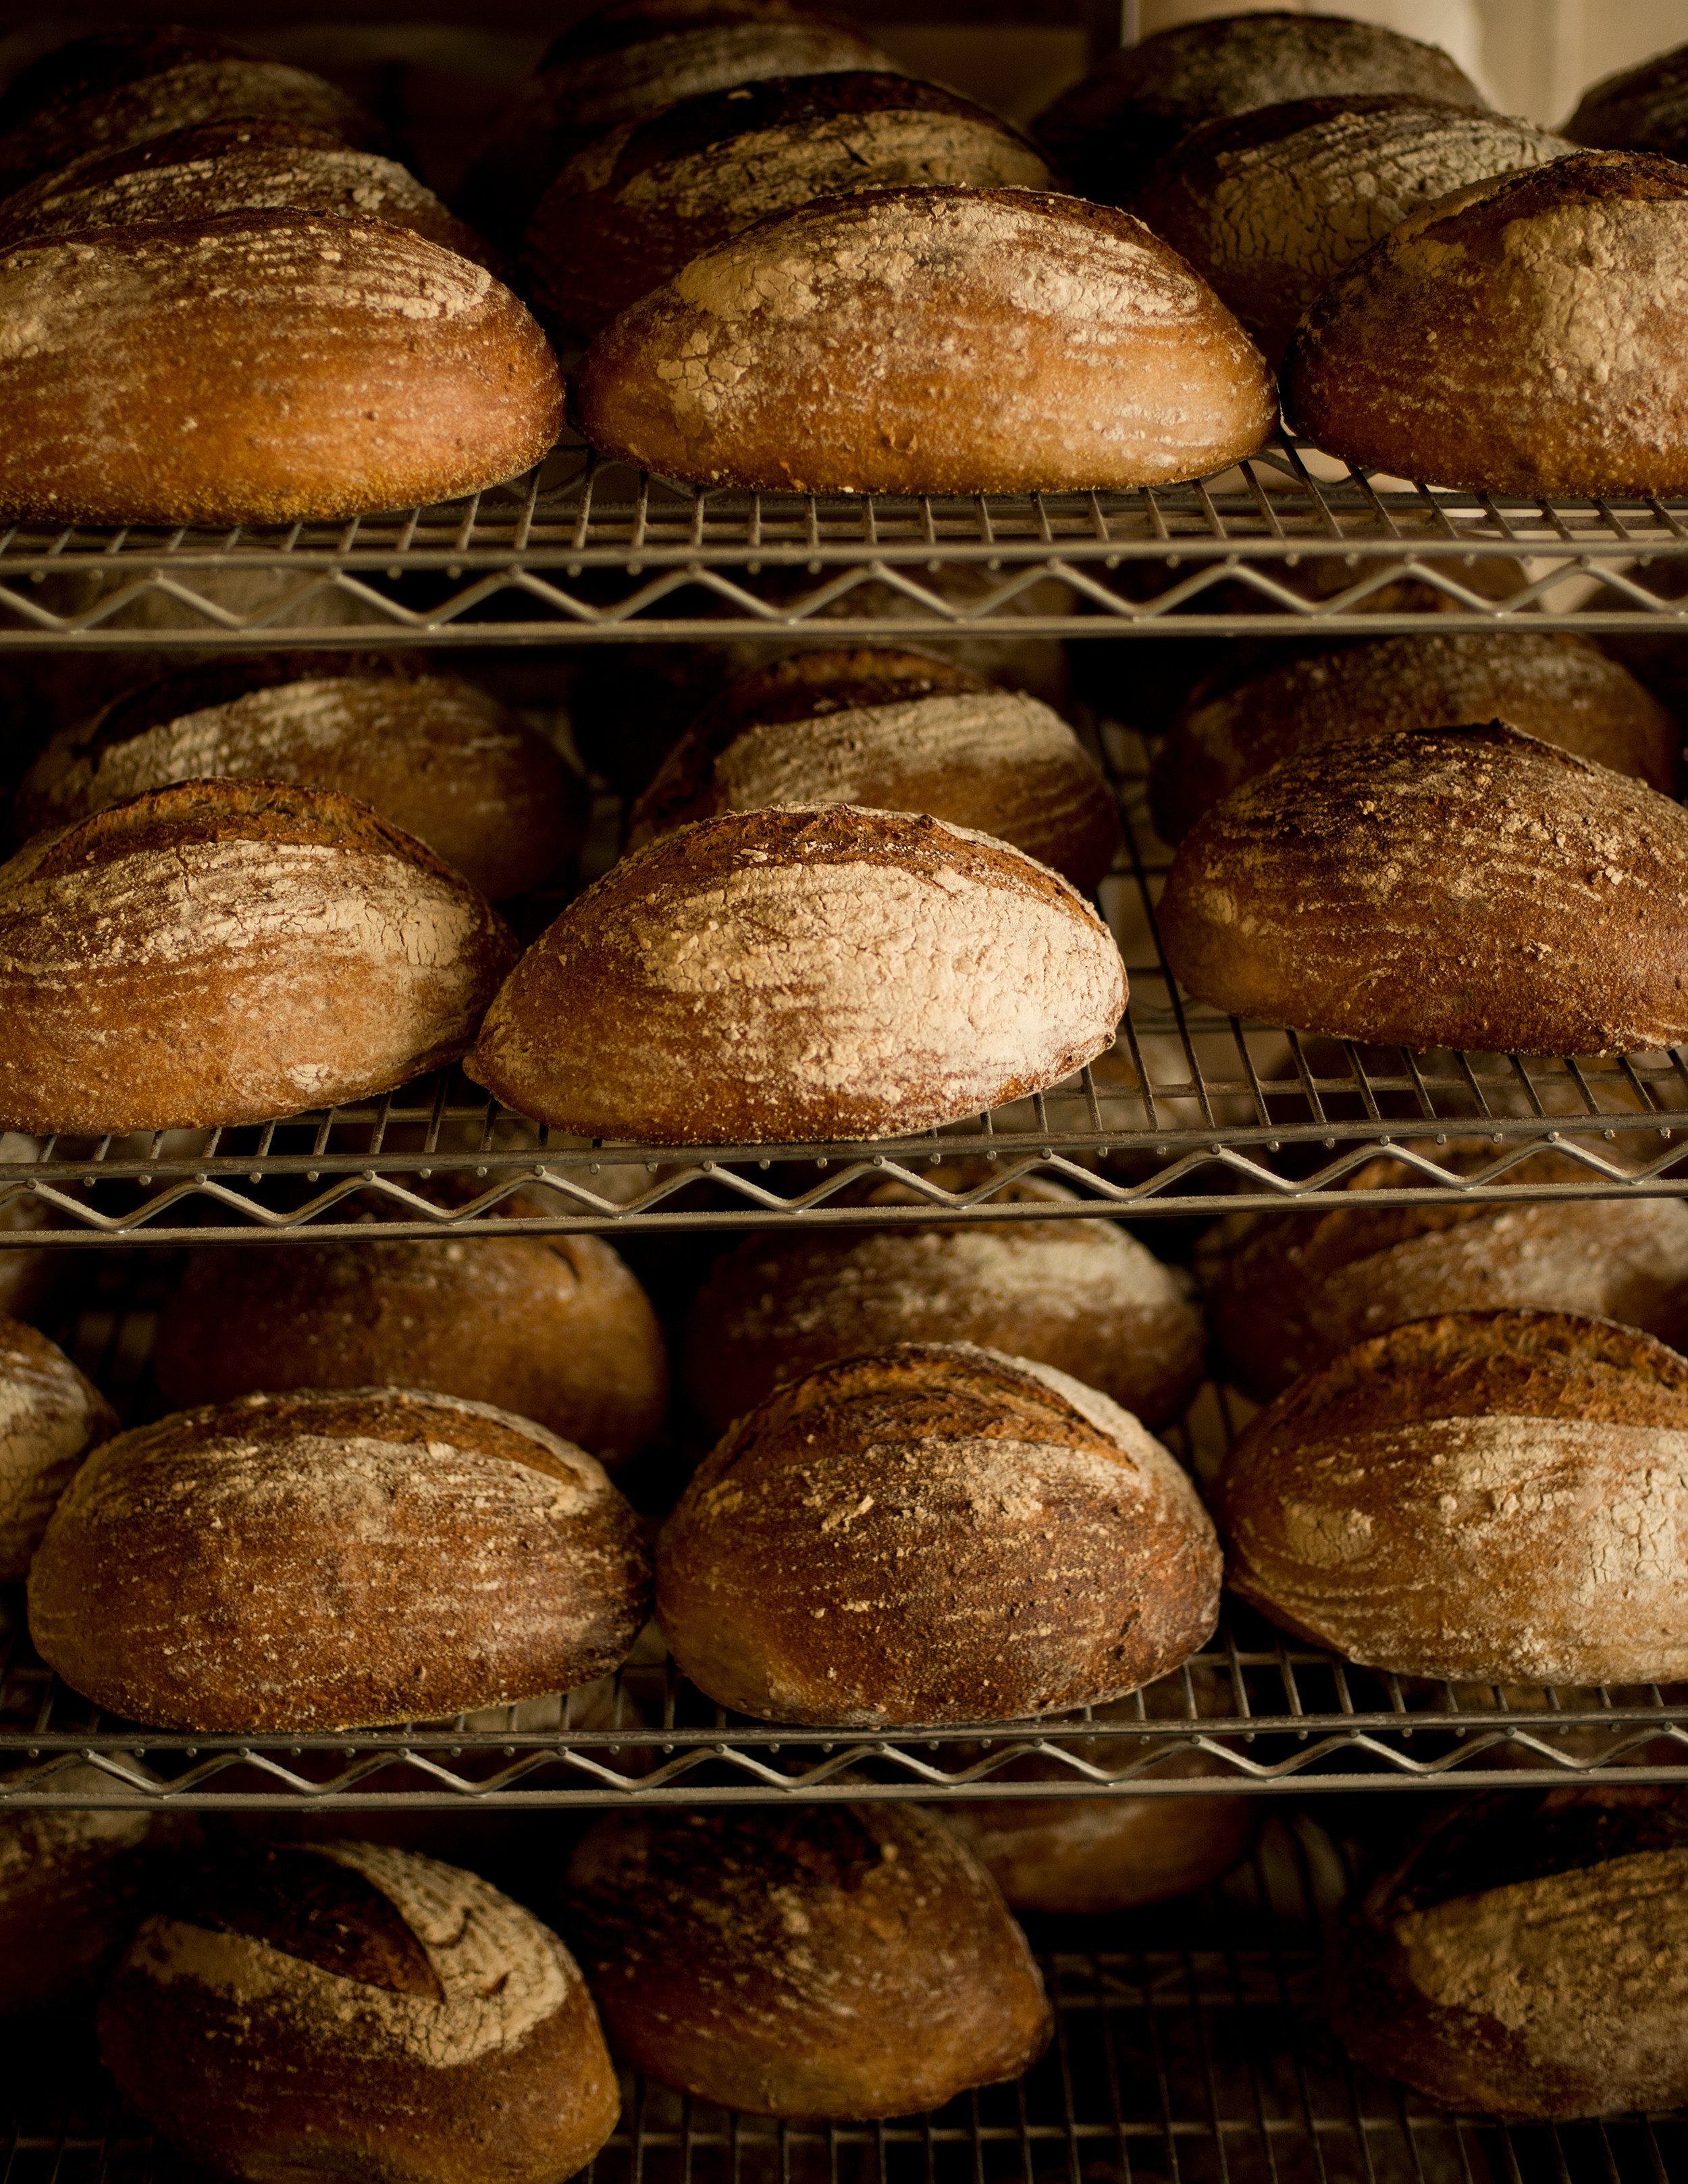 sage bakehouse bakery and cafe santa fe new mexico